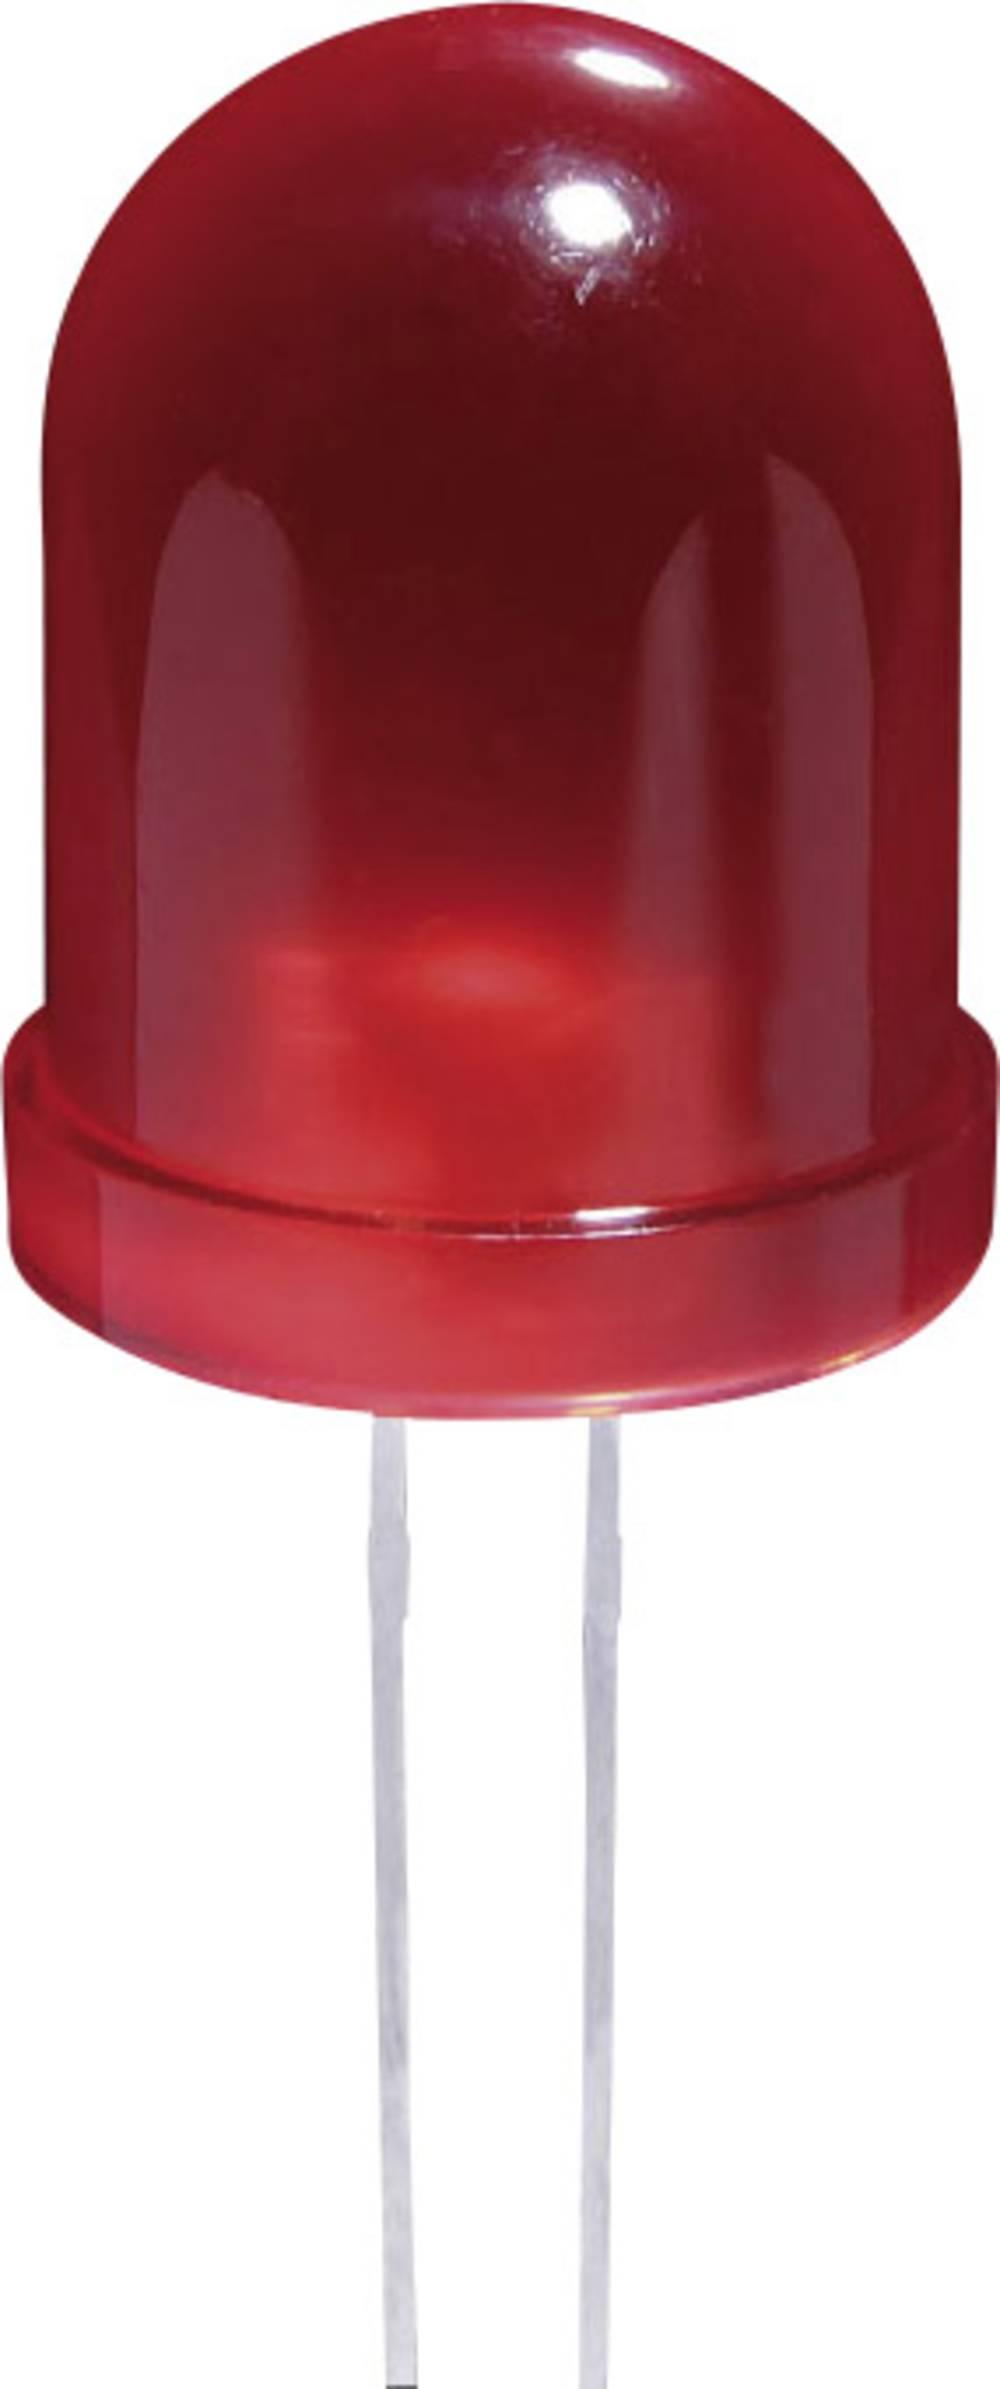 Ožičena LED dioda, rumena, okrogla 10 mm 50 mcd 60 ° 20 mA 2.1 V